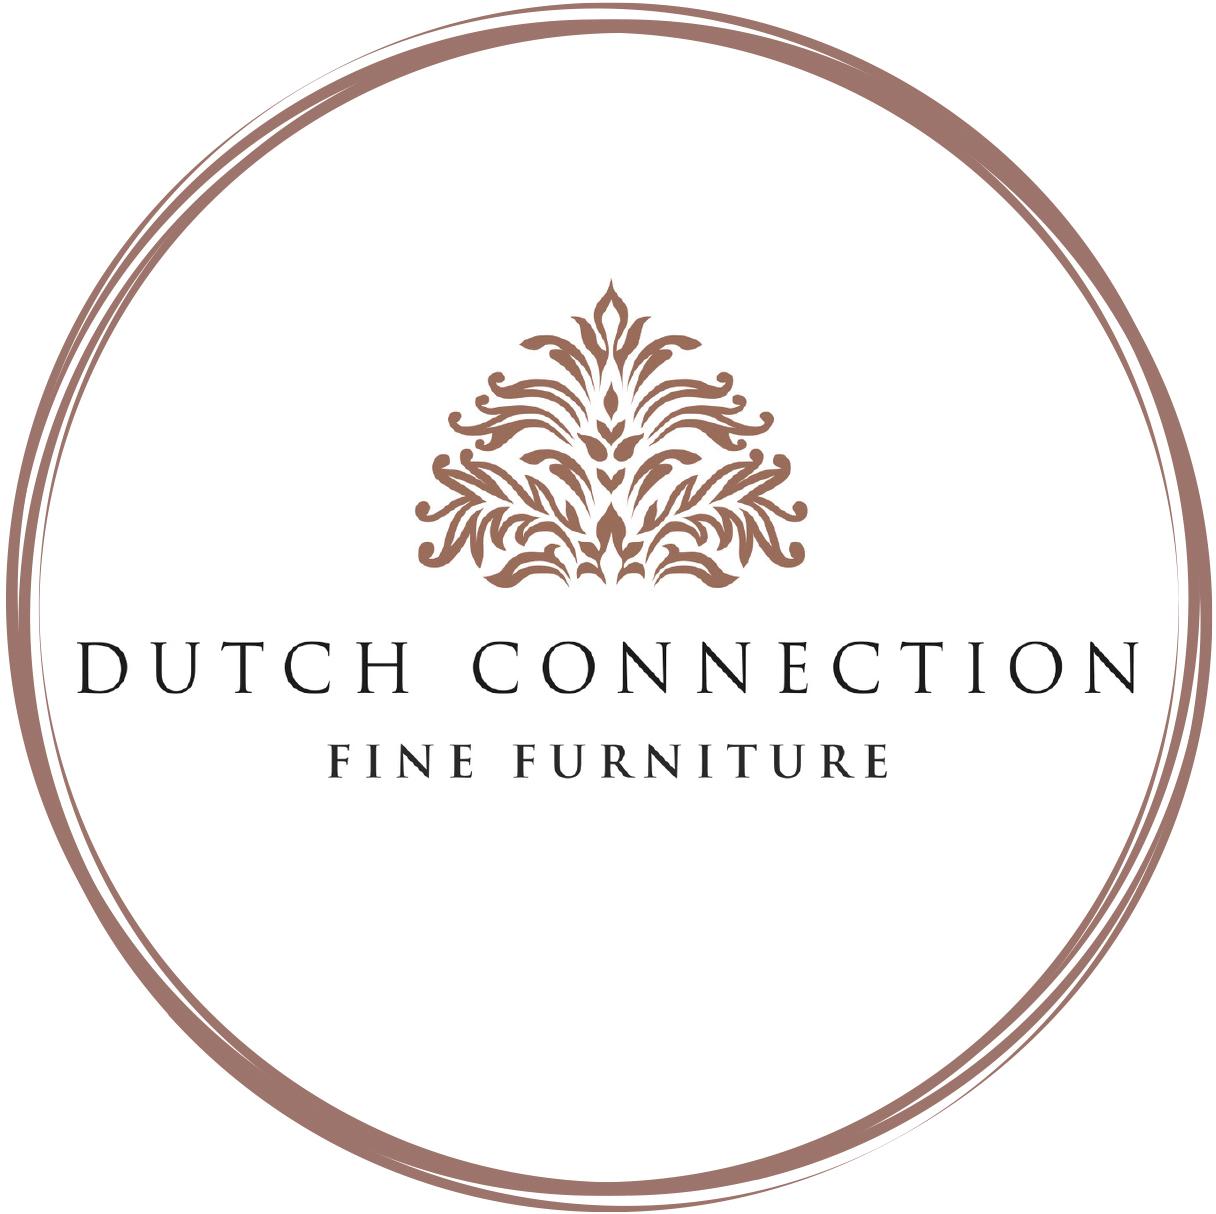 Dutch Connection - Fine Furniture